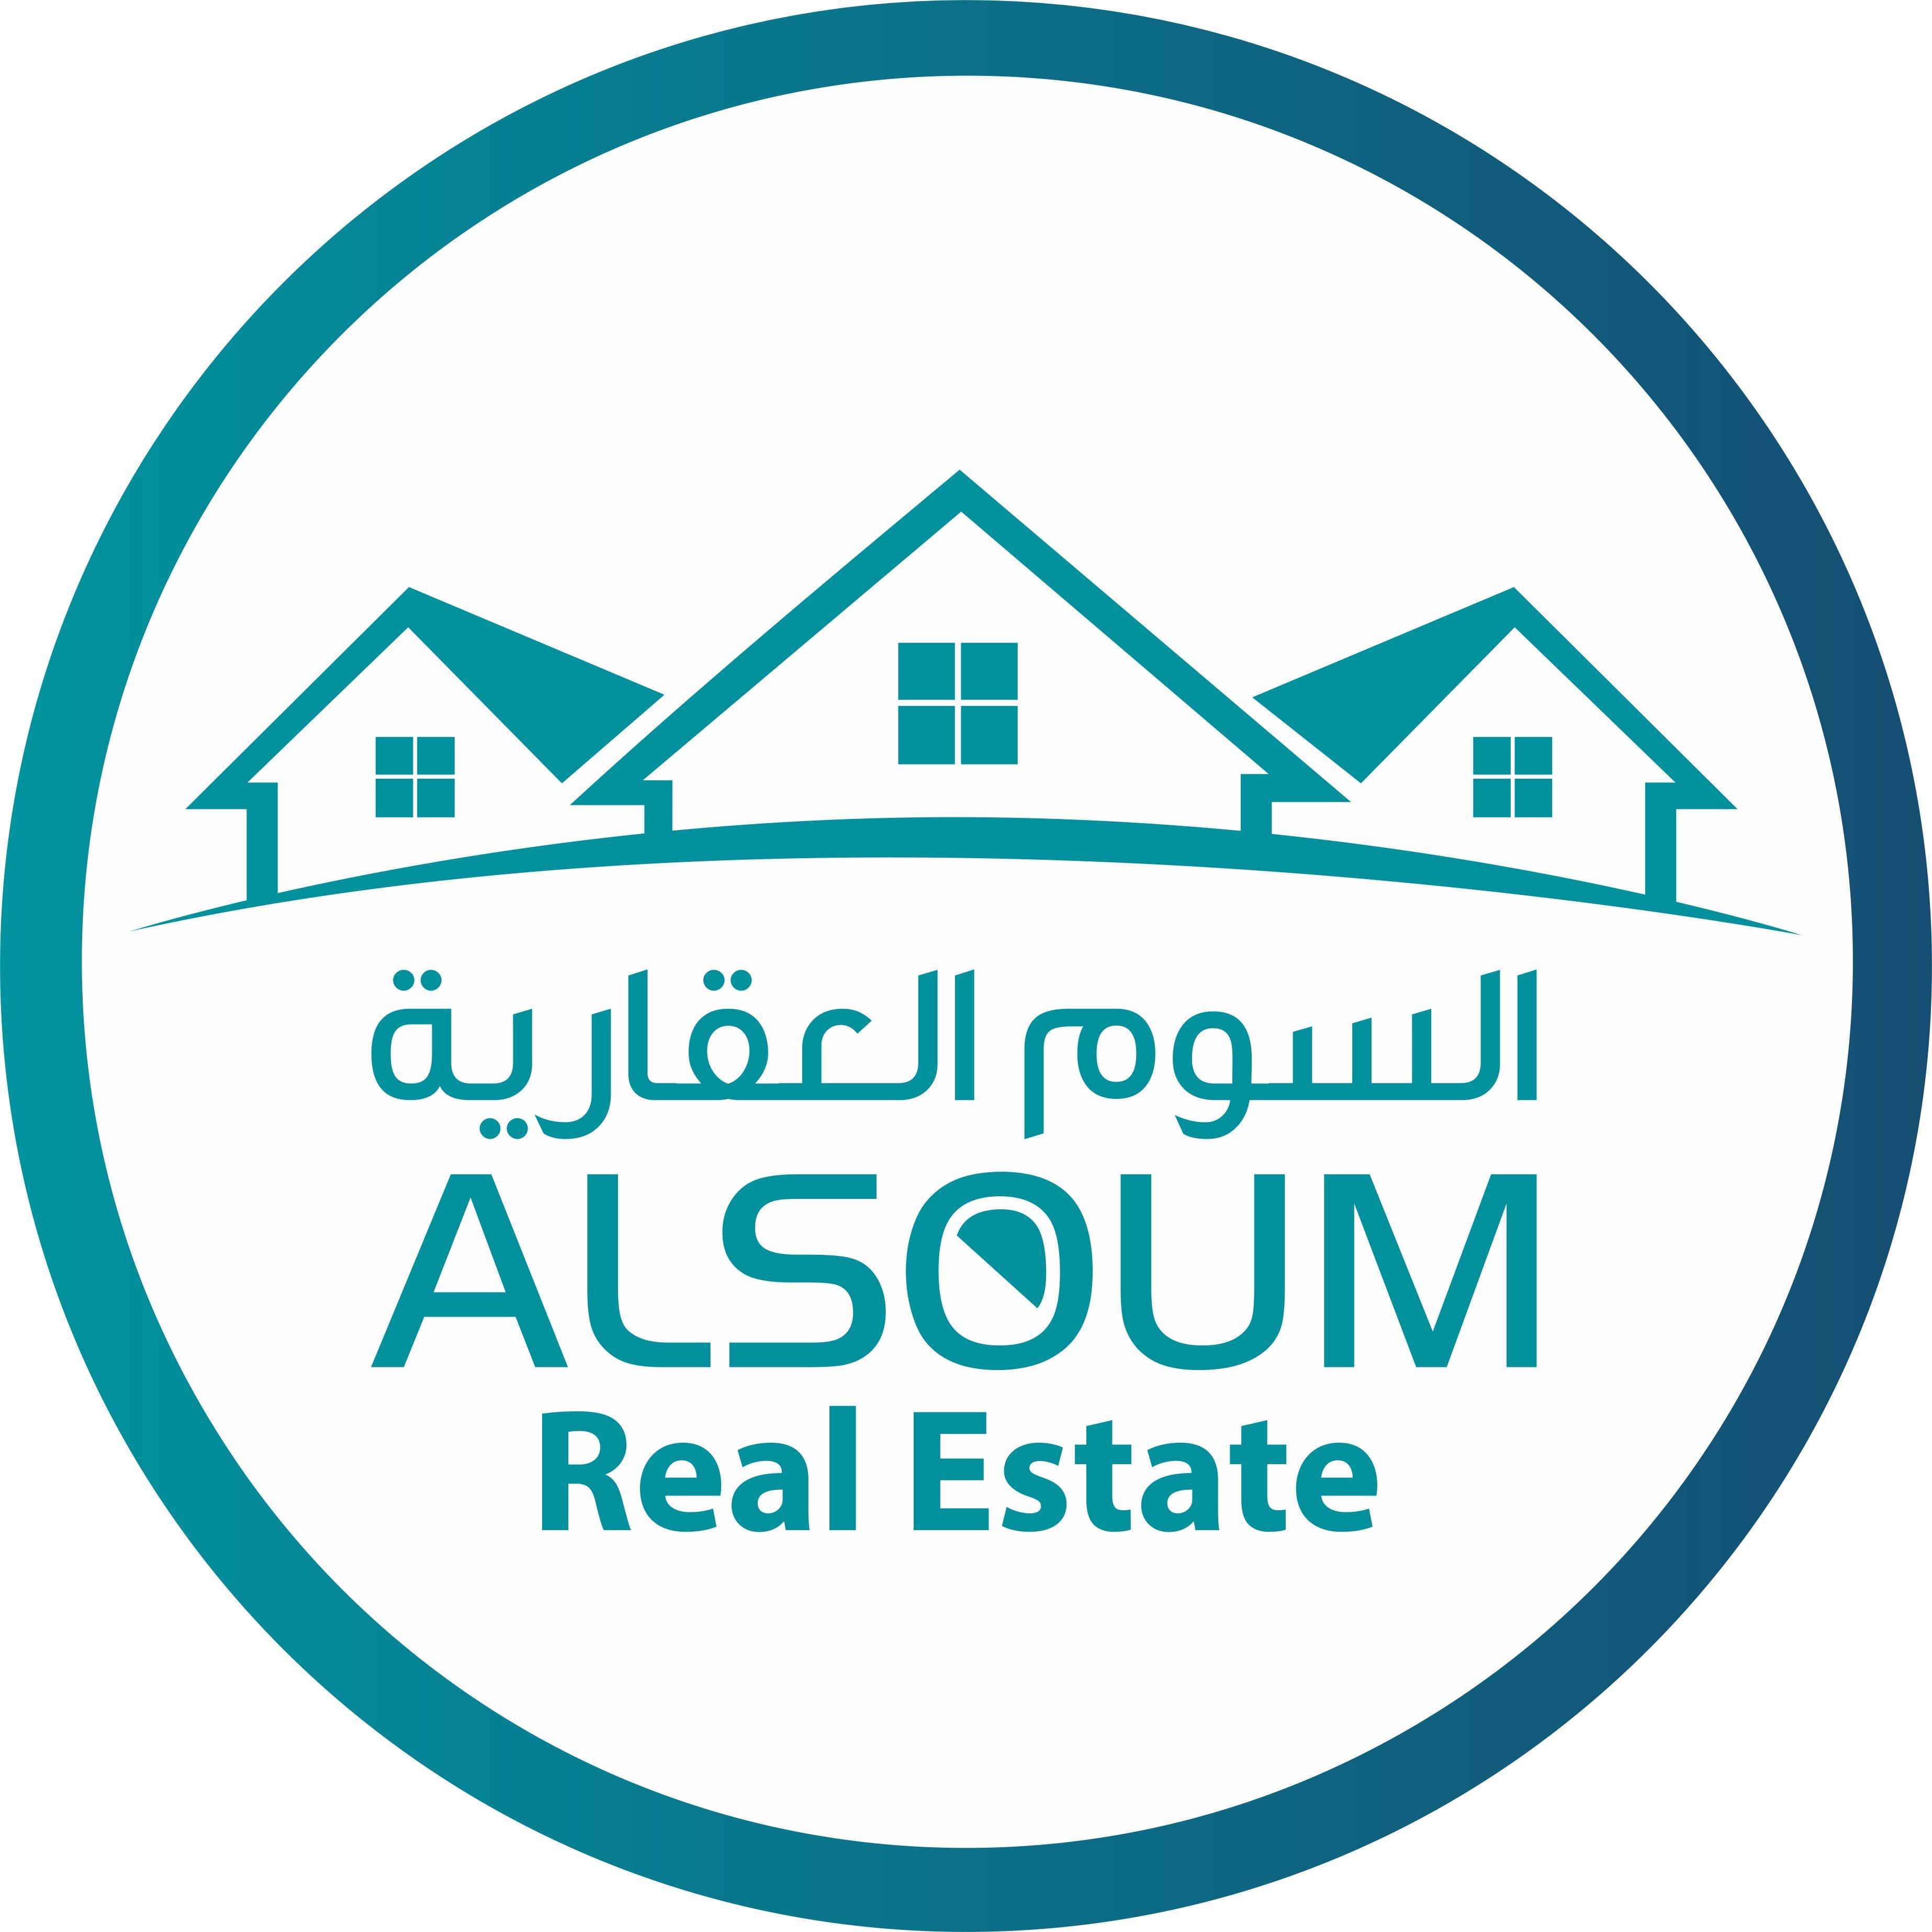 Al Soum Real Estate